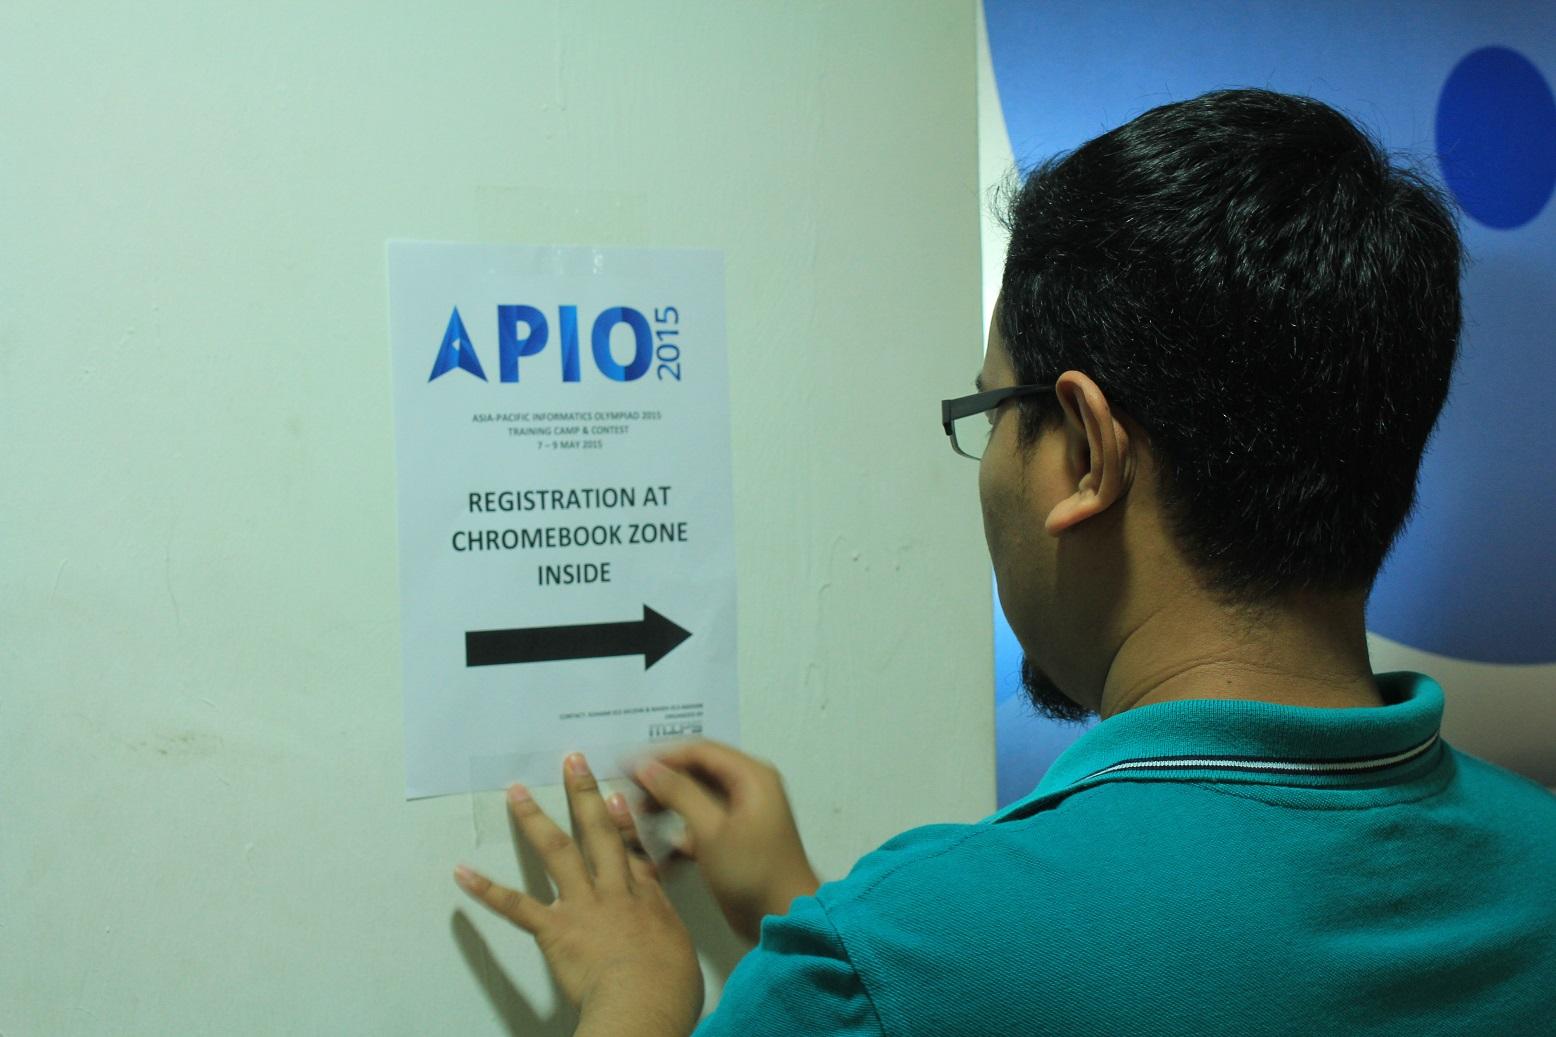 APIO site set up